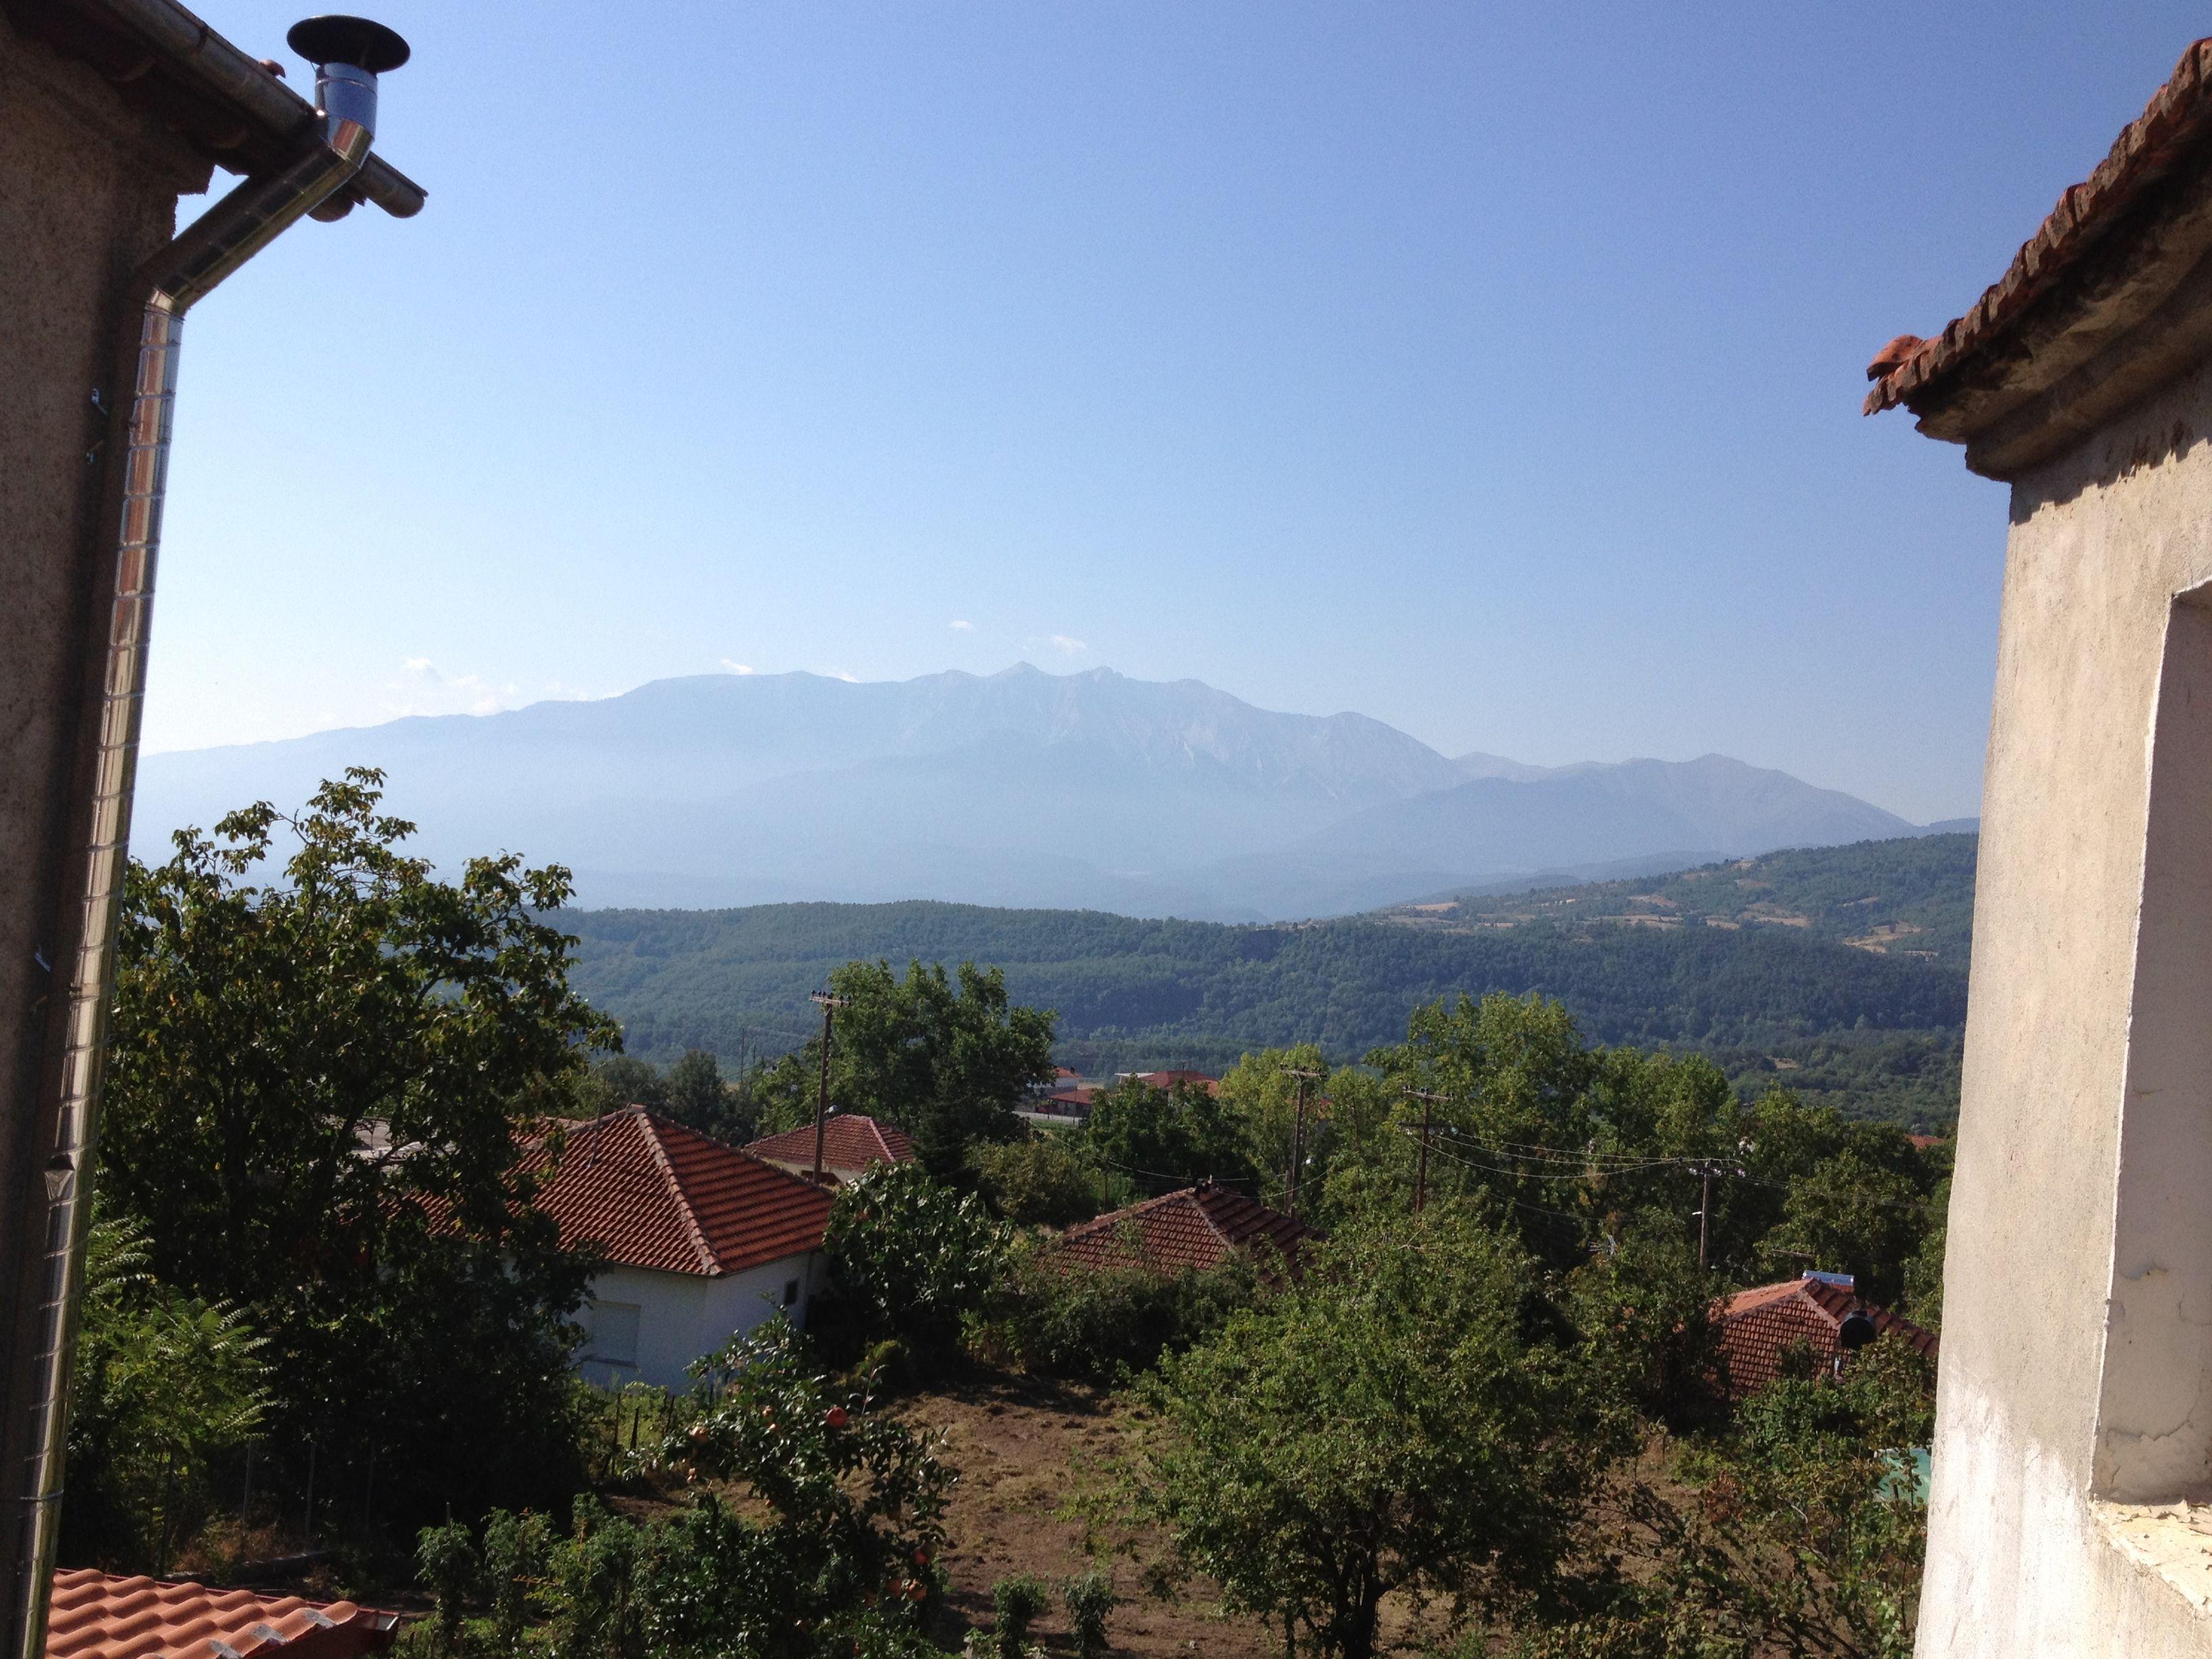 Olymp (view from Grandmas balcony in Greece)